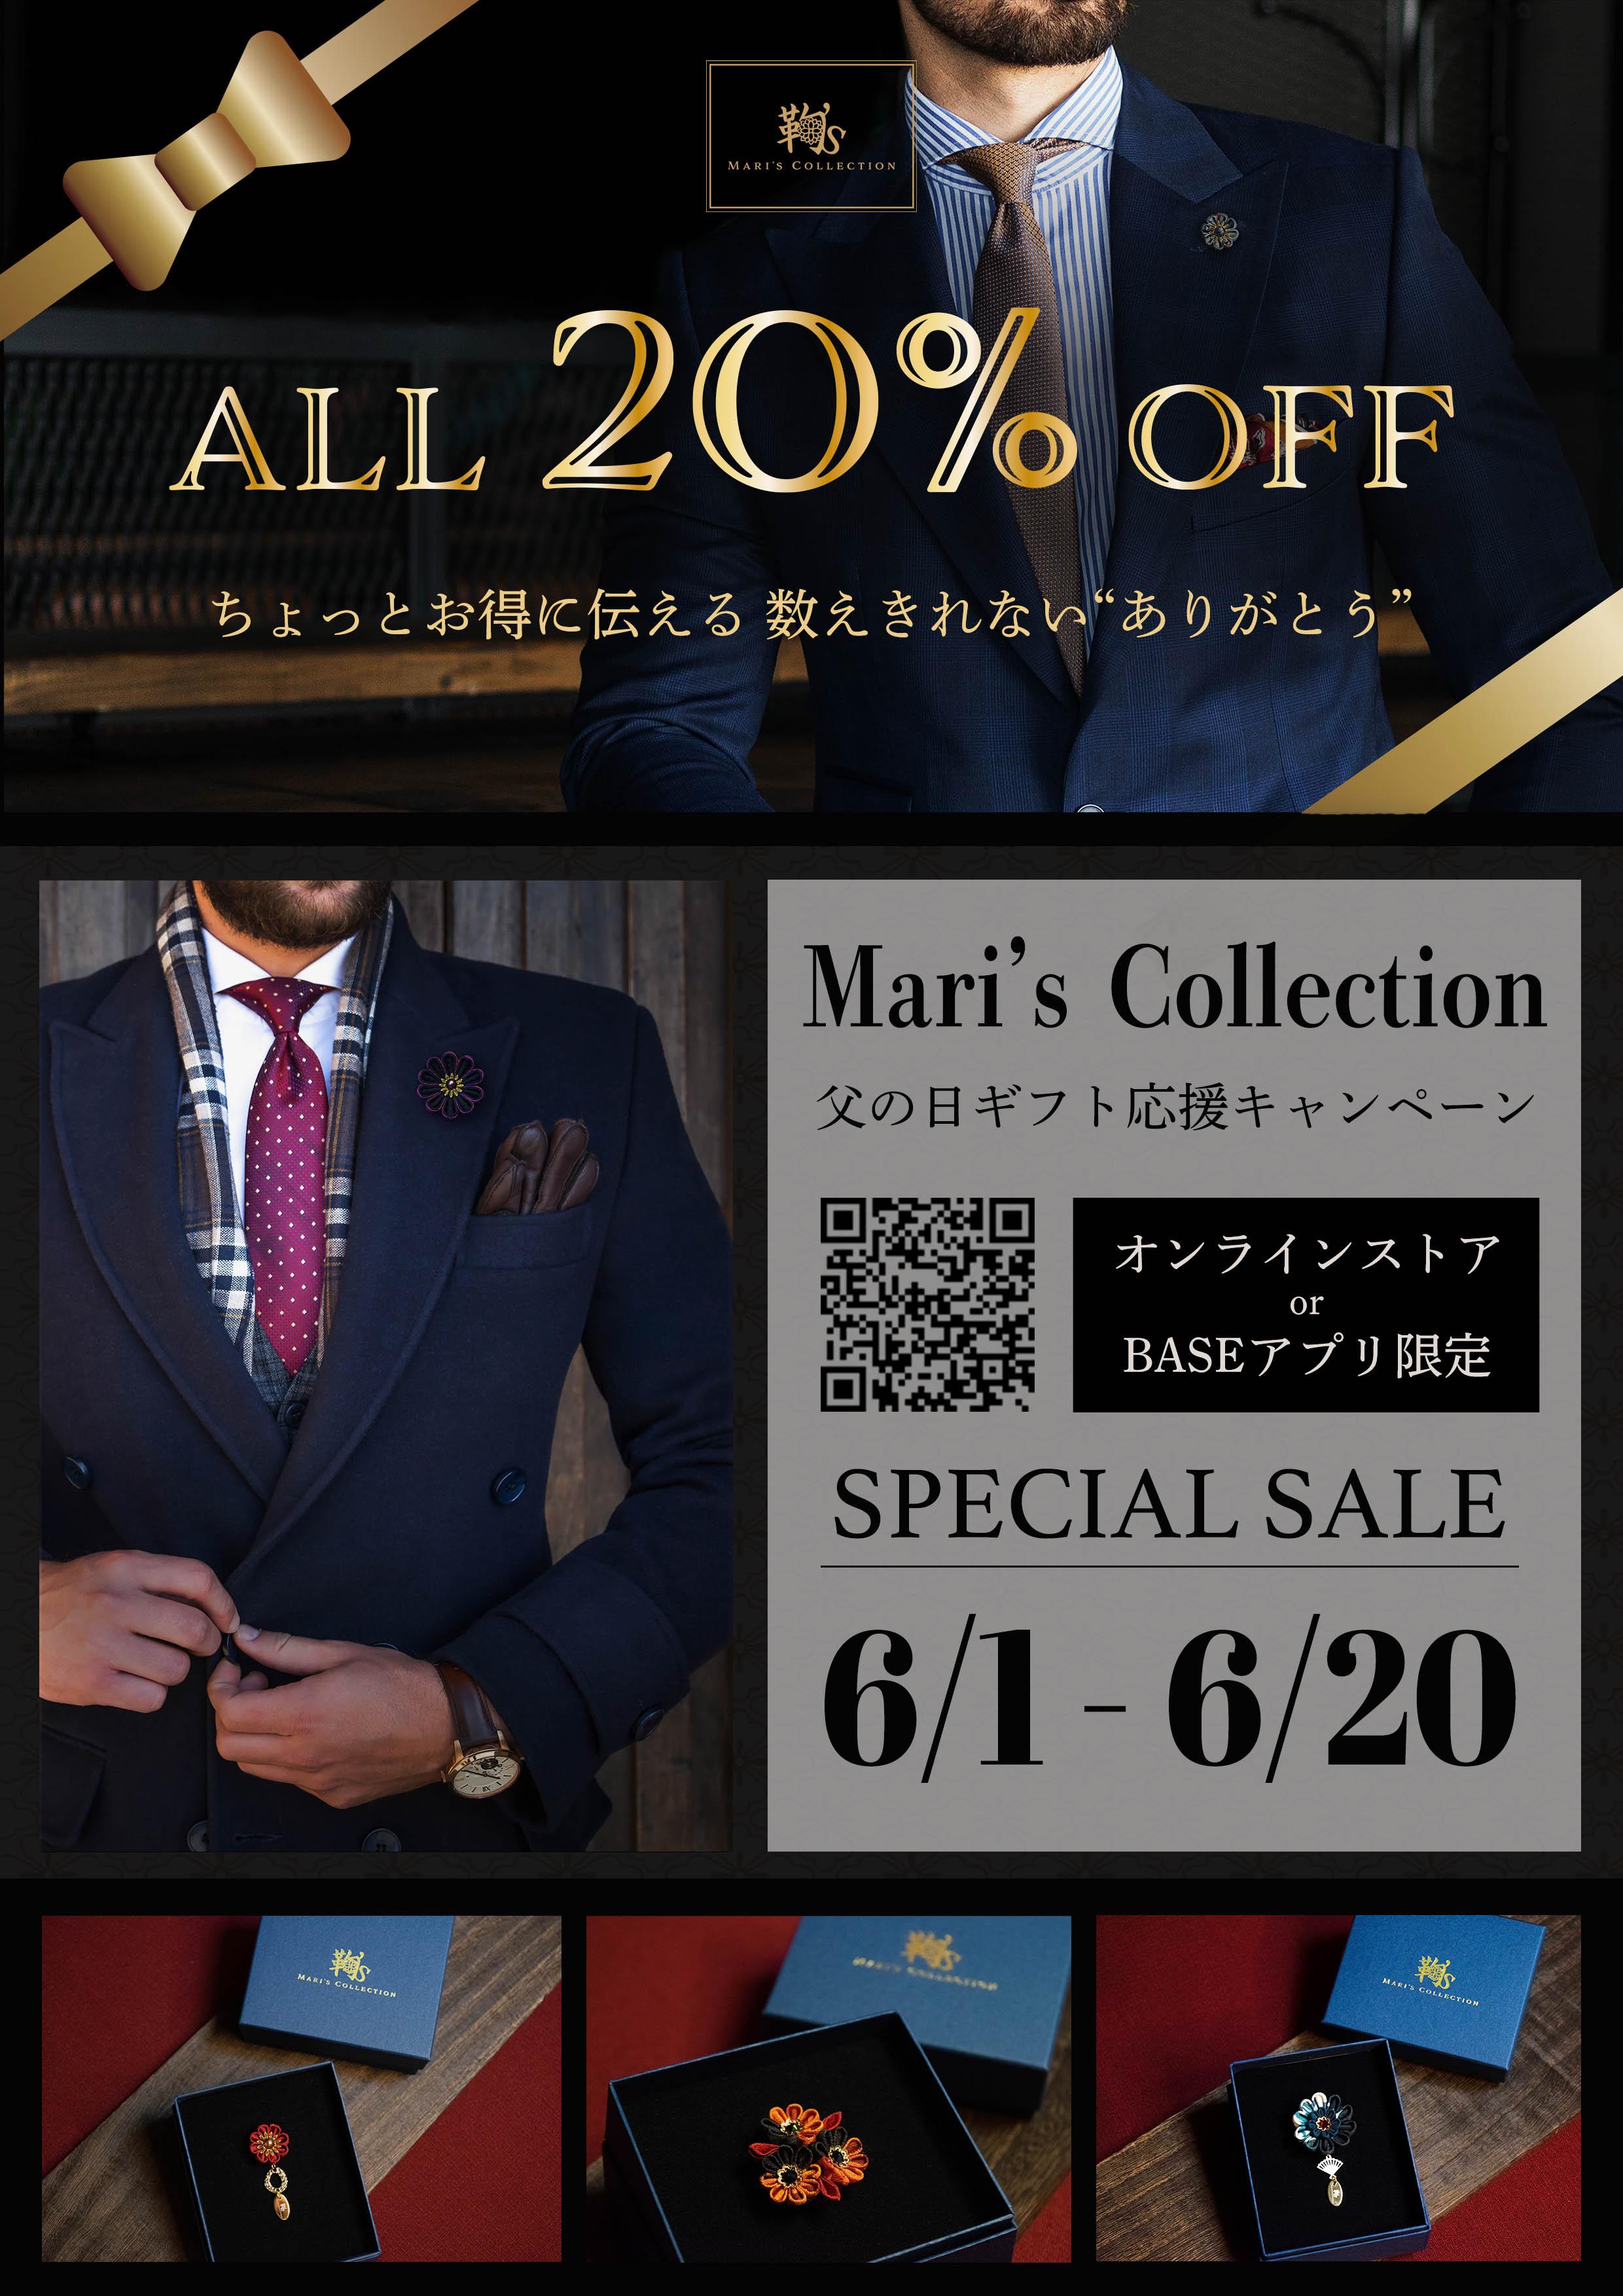 《Mari's Collection》上質な贈り物を特別価格でご提供!父の日ギフト応援キャンペーン